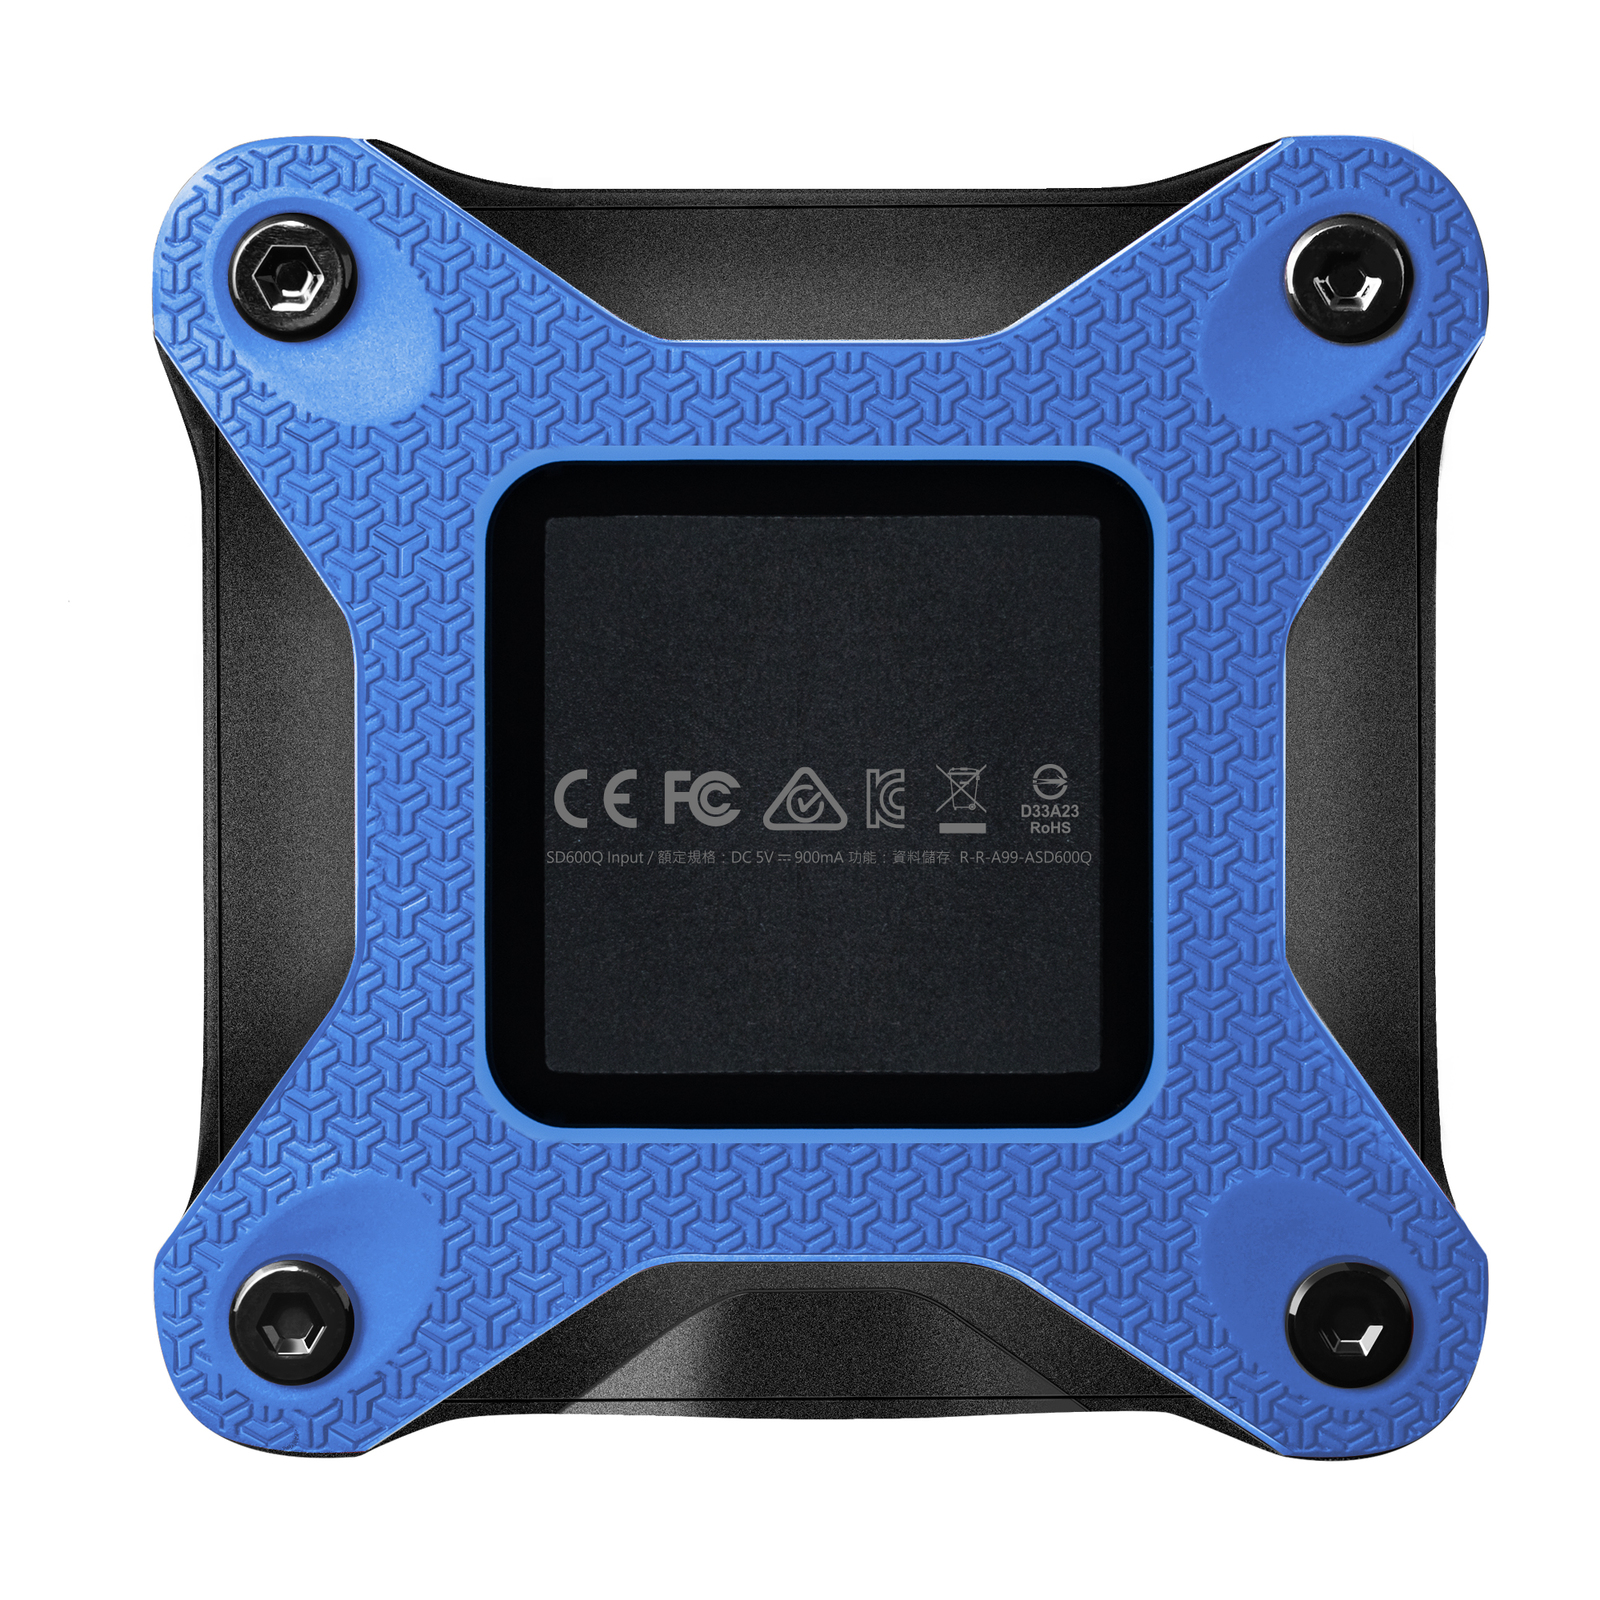 240GB External SSD ADATA Blue image